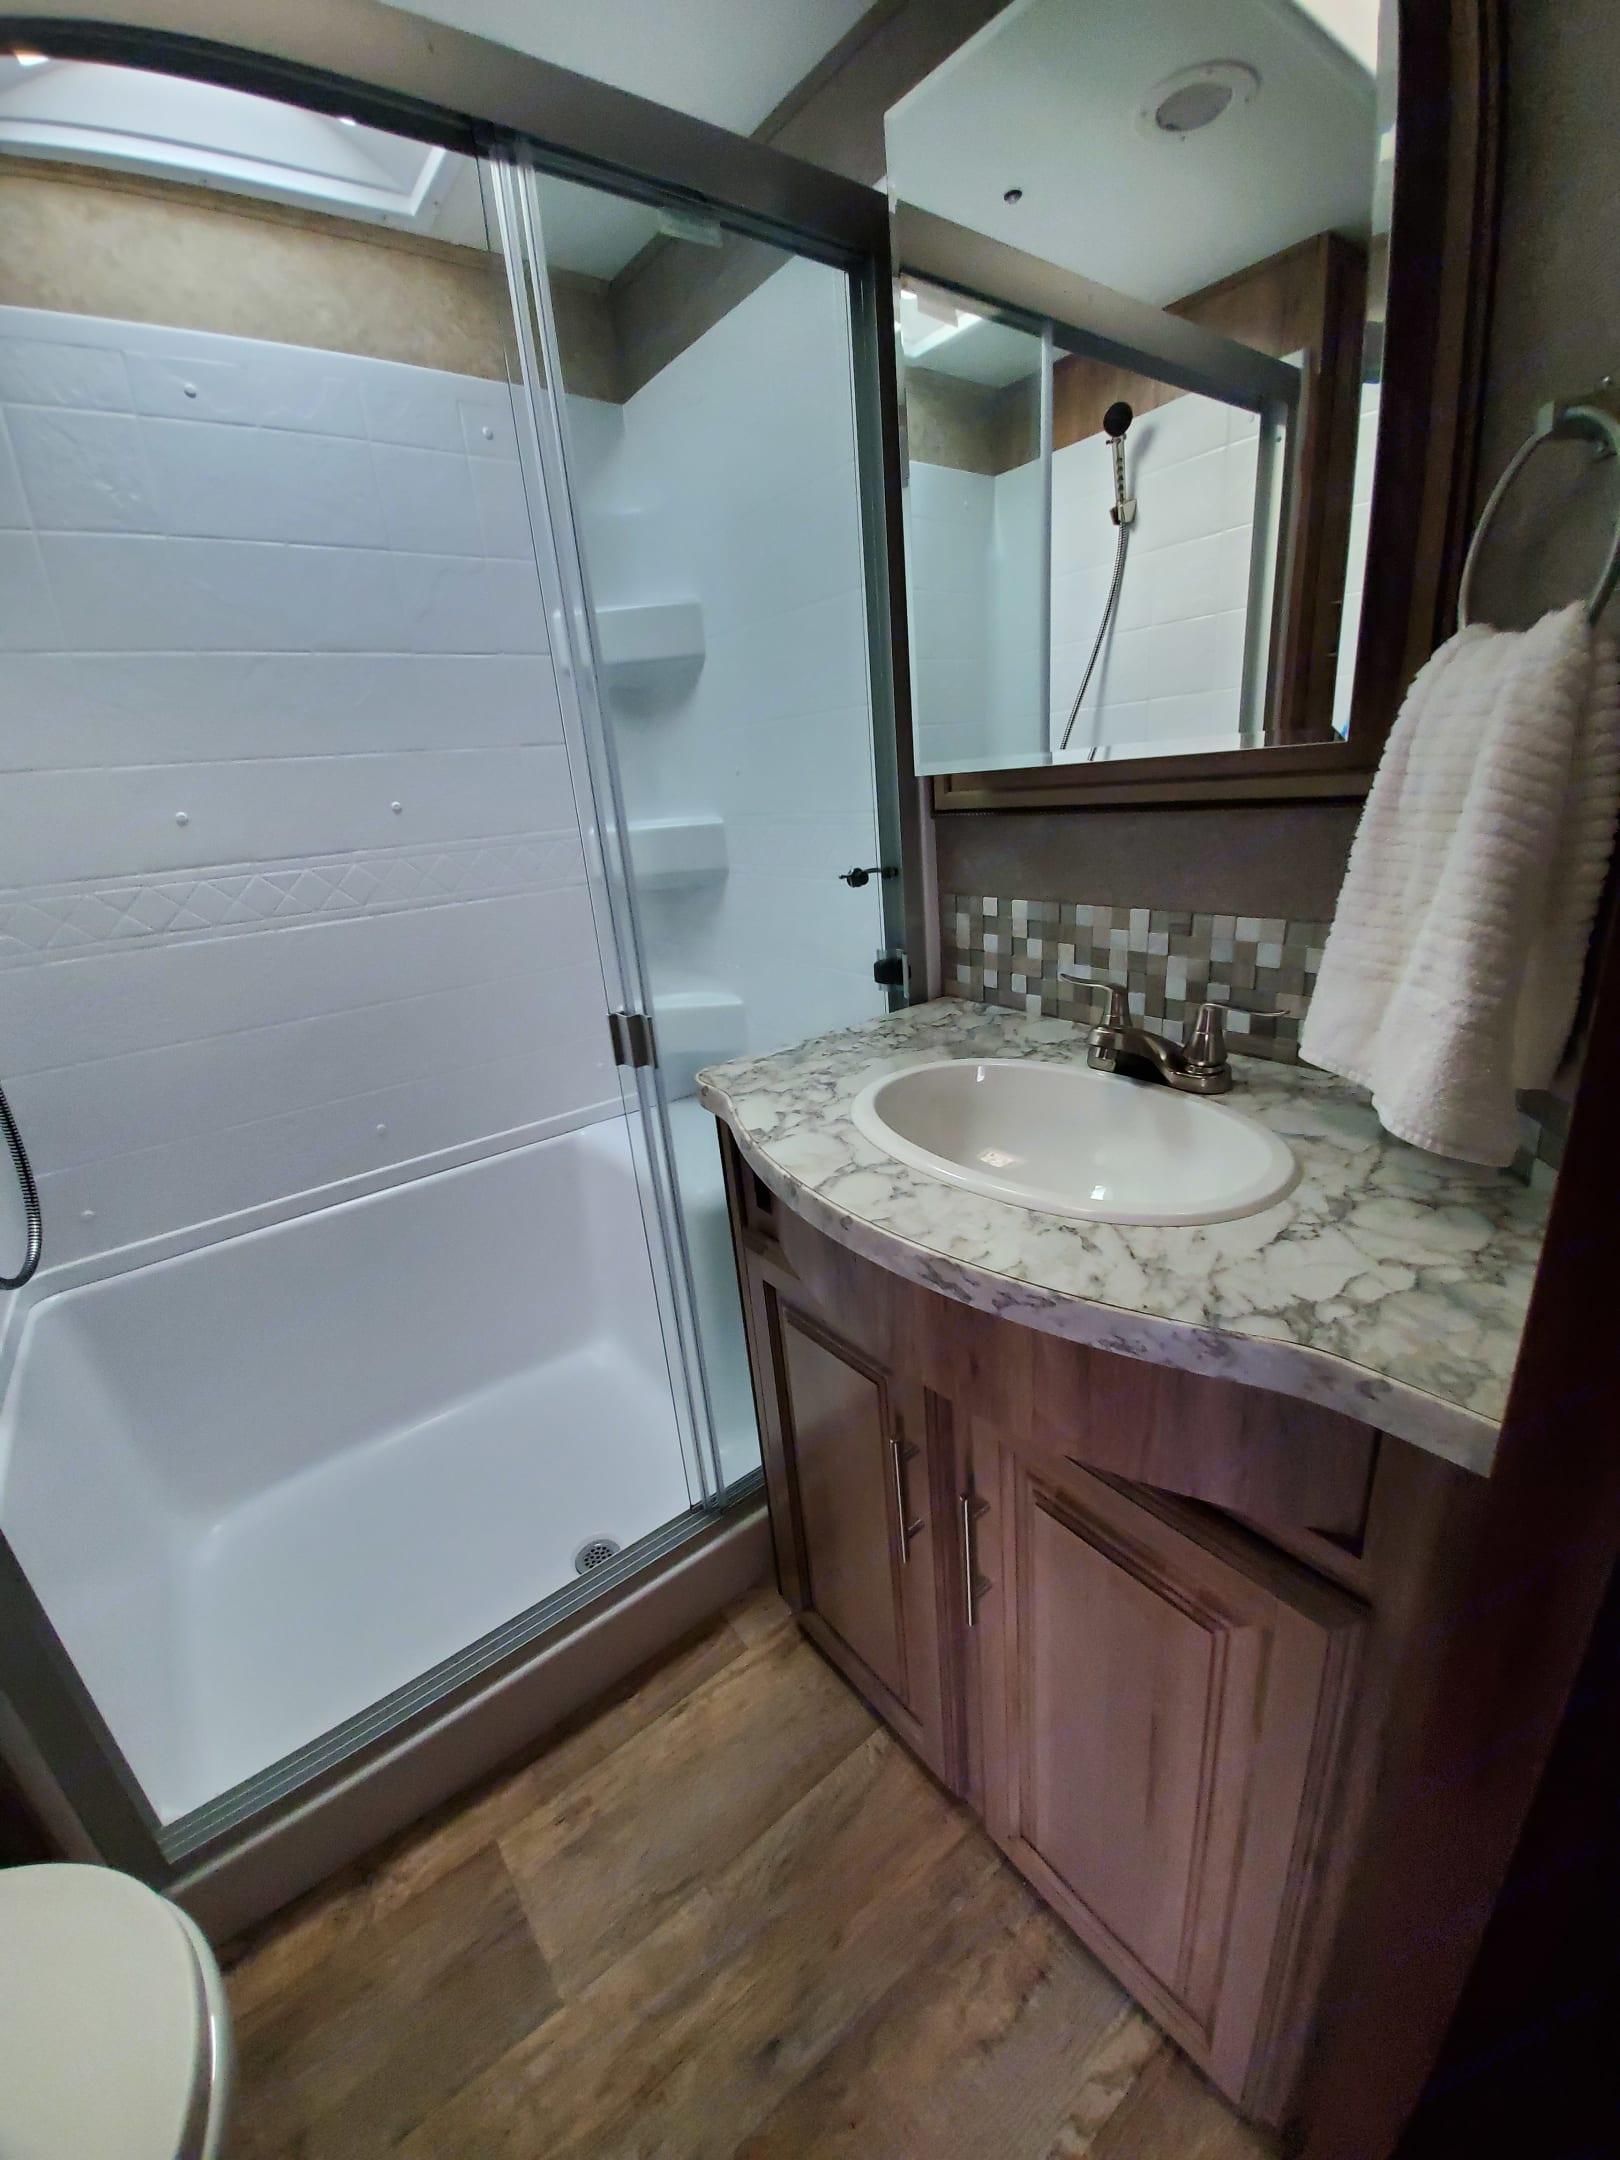 Main Bathroom: sink and shower. Jayco Eagle 347BHOK 2018